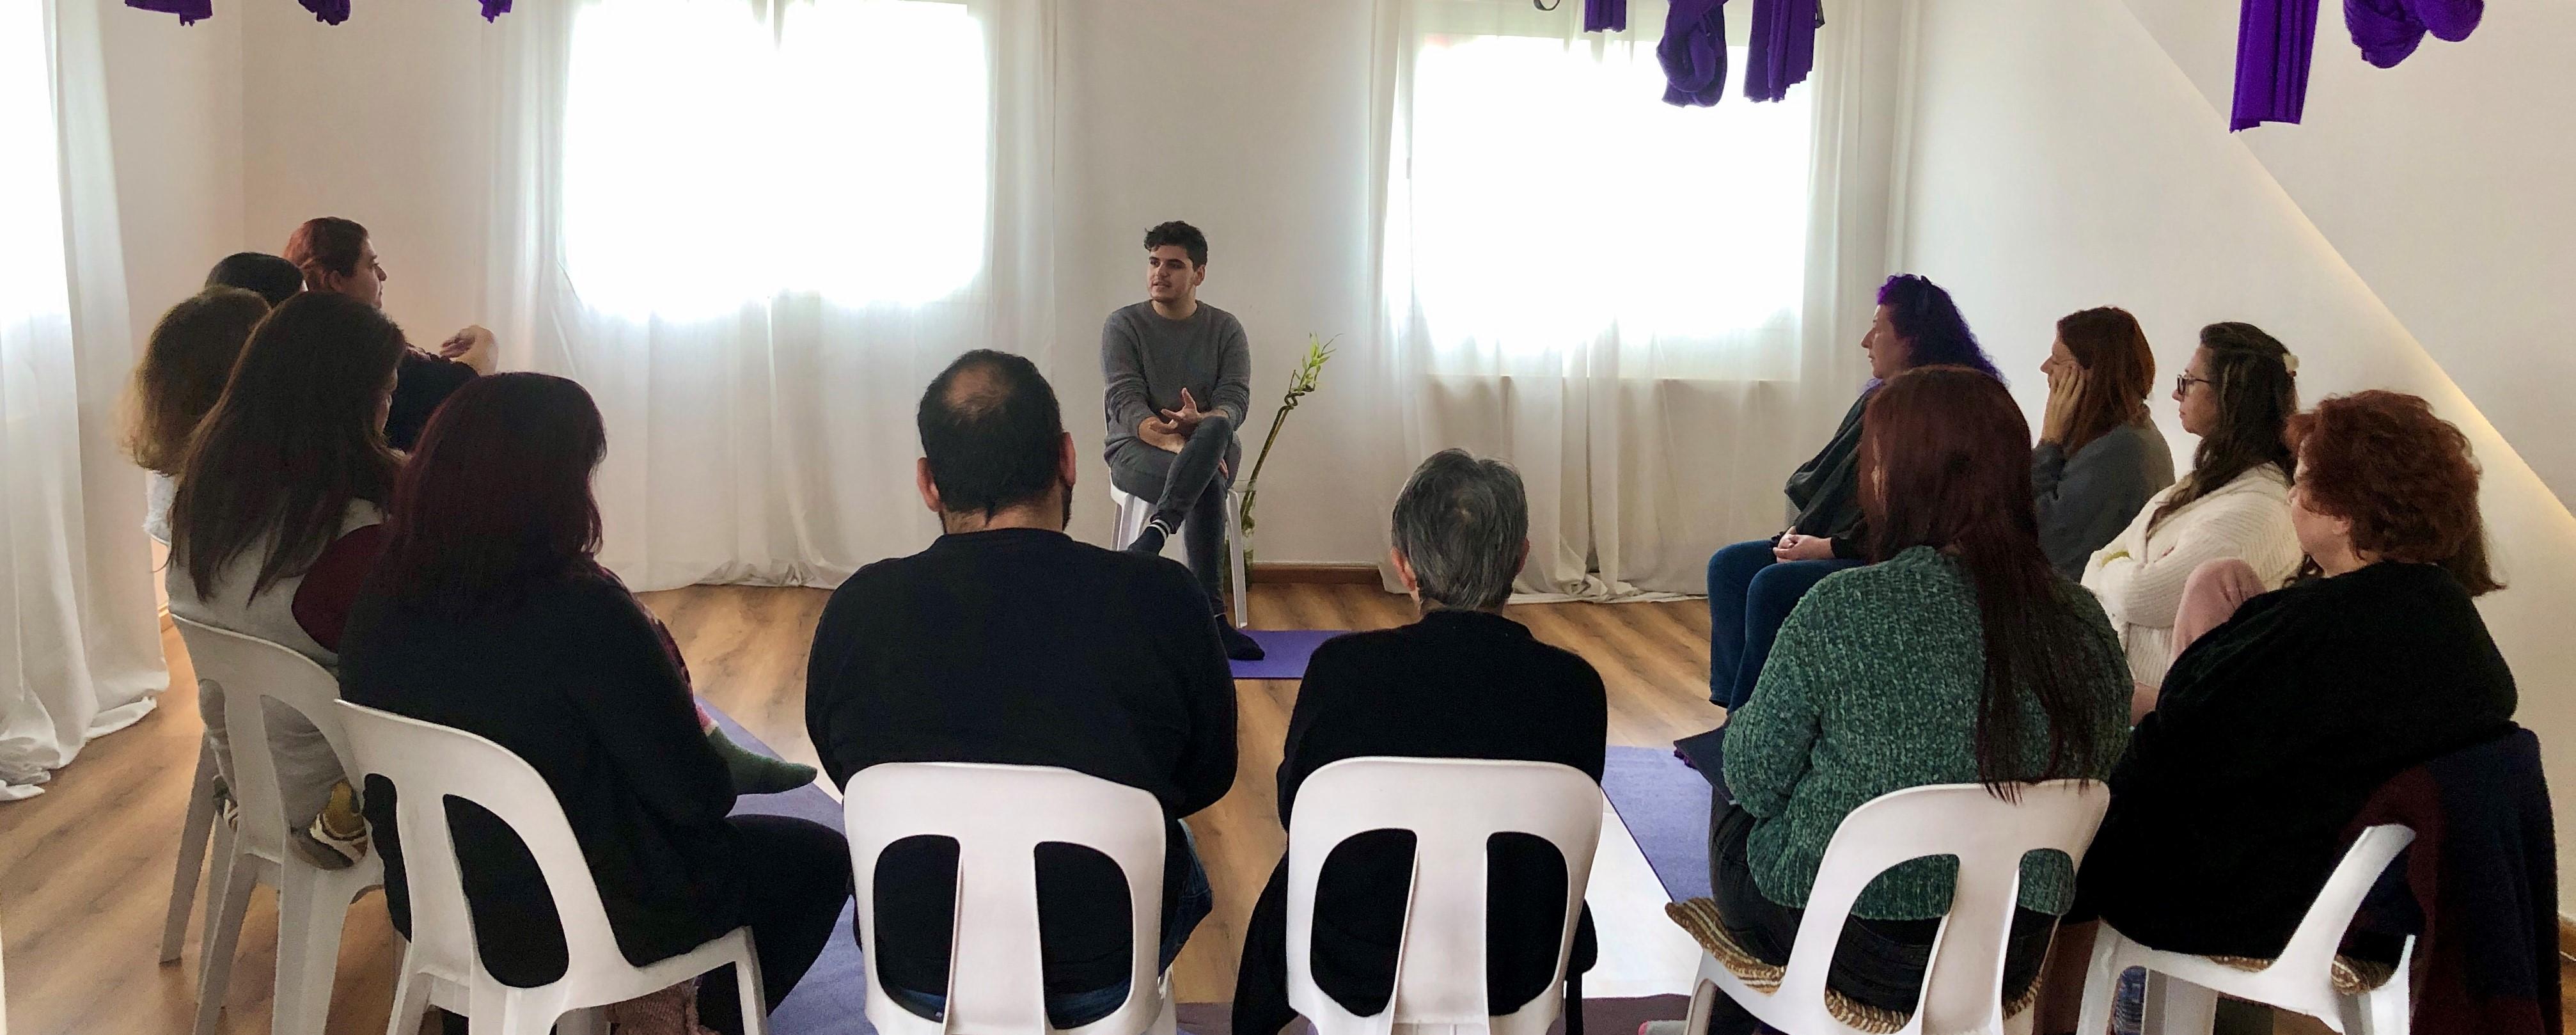 February 2020, Giorgos teaching the Introduction to Mediumship workshop